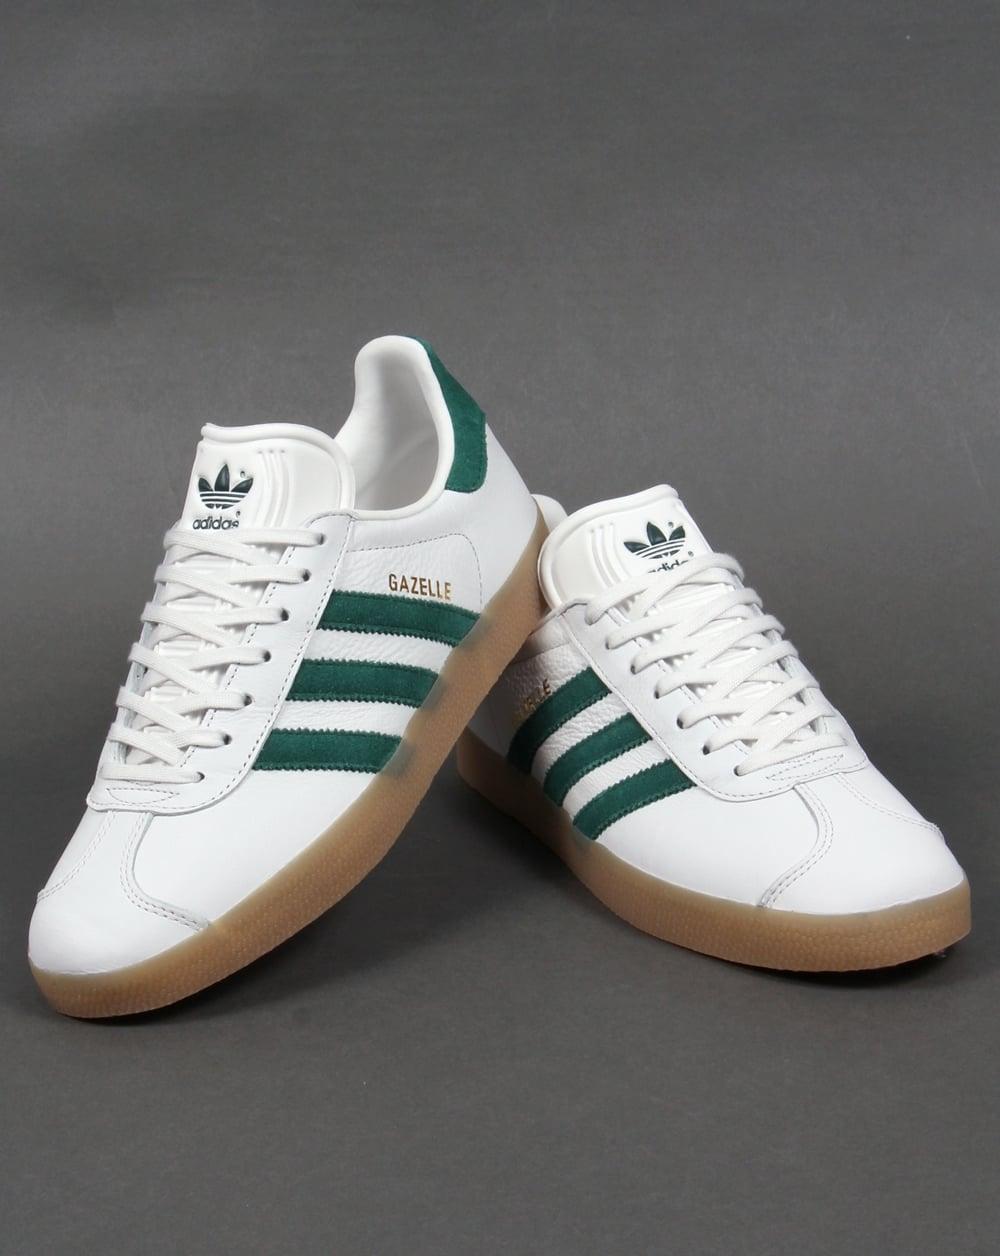 green adidas gazelle trainers